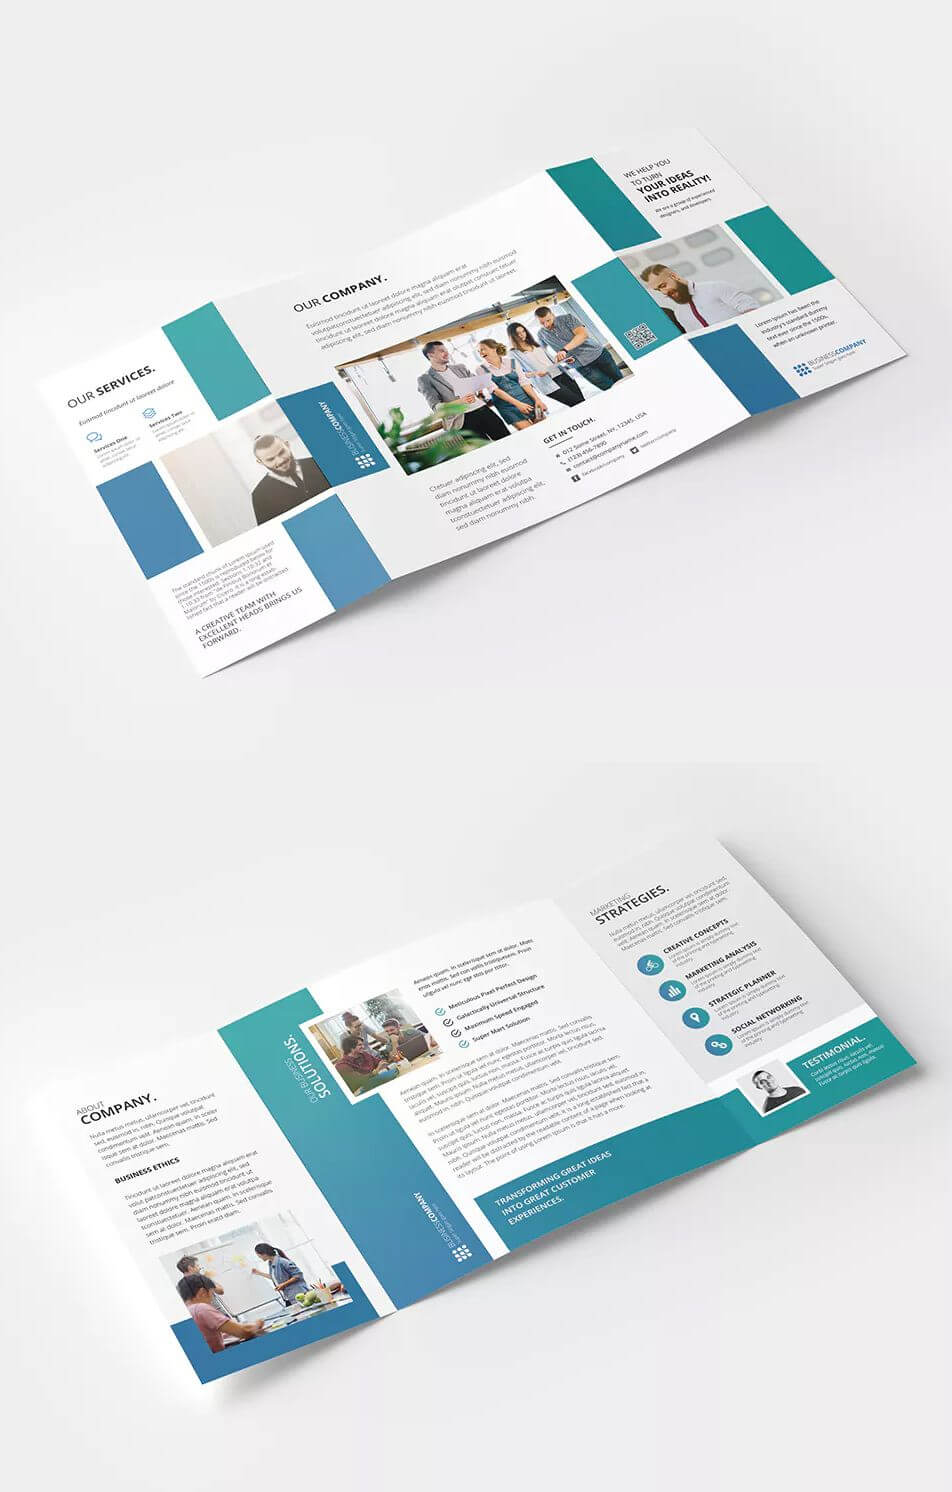 Square Gate Fold Brochure Template Psd - Cmyk Color Mode intended for Gate Fold Brochure Template Indesign